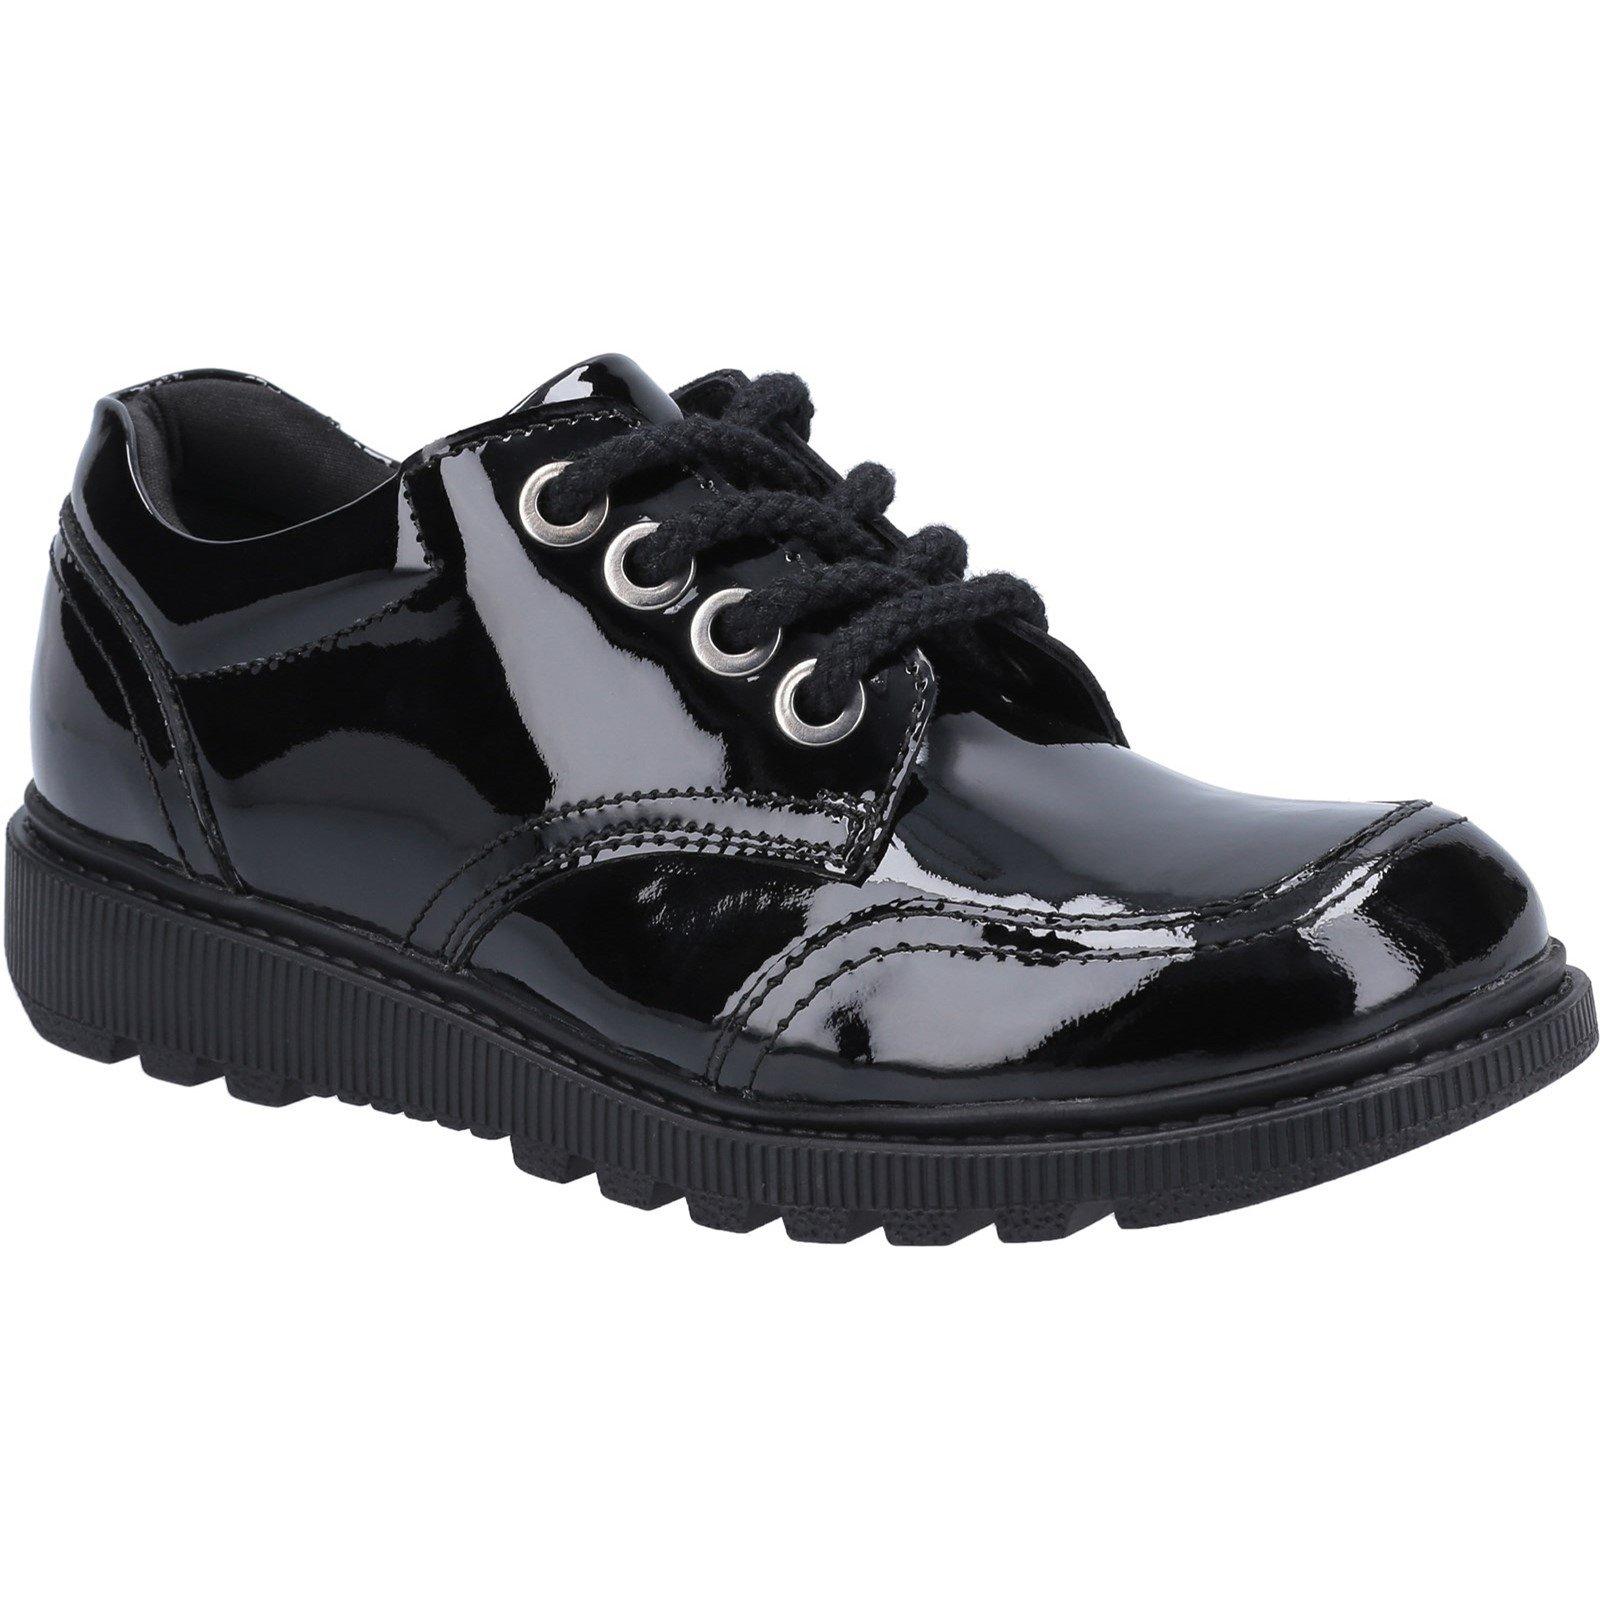 Hush Puppies Kid's Kiera Junior Patent School Shoe Black 30823 - Patent Black 13